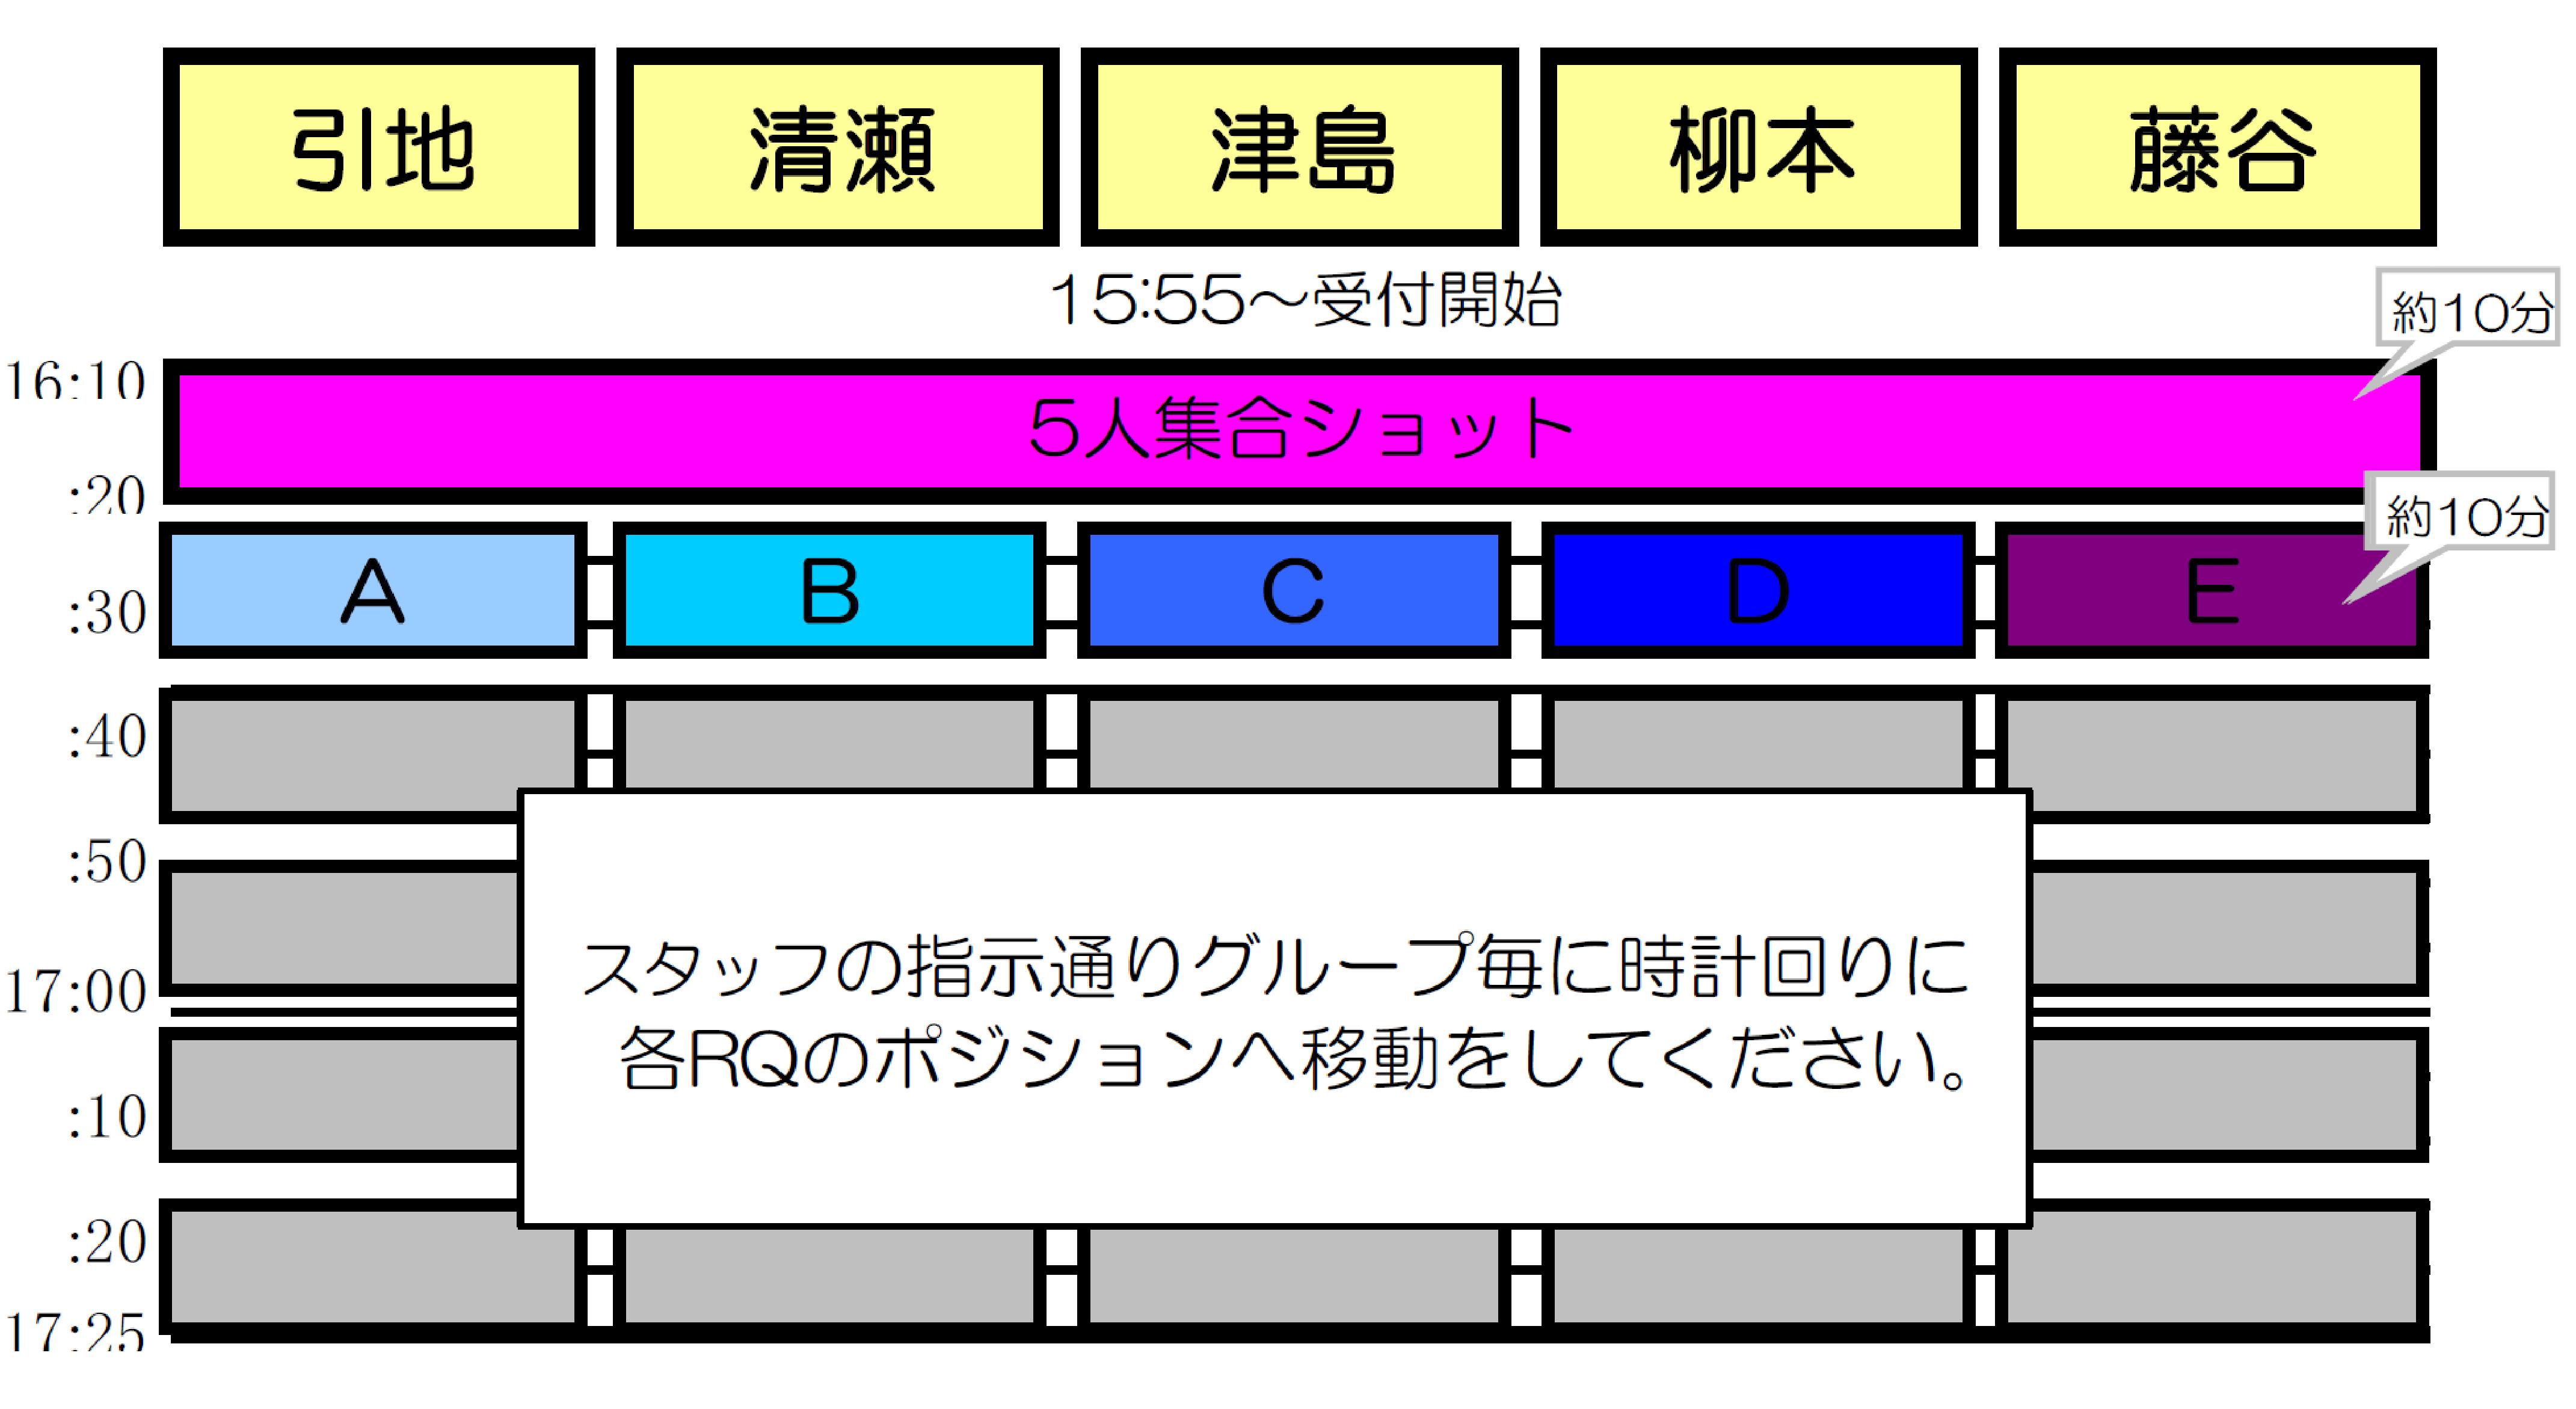 0917RQ撮影会4部スケ